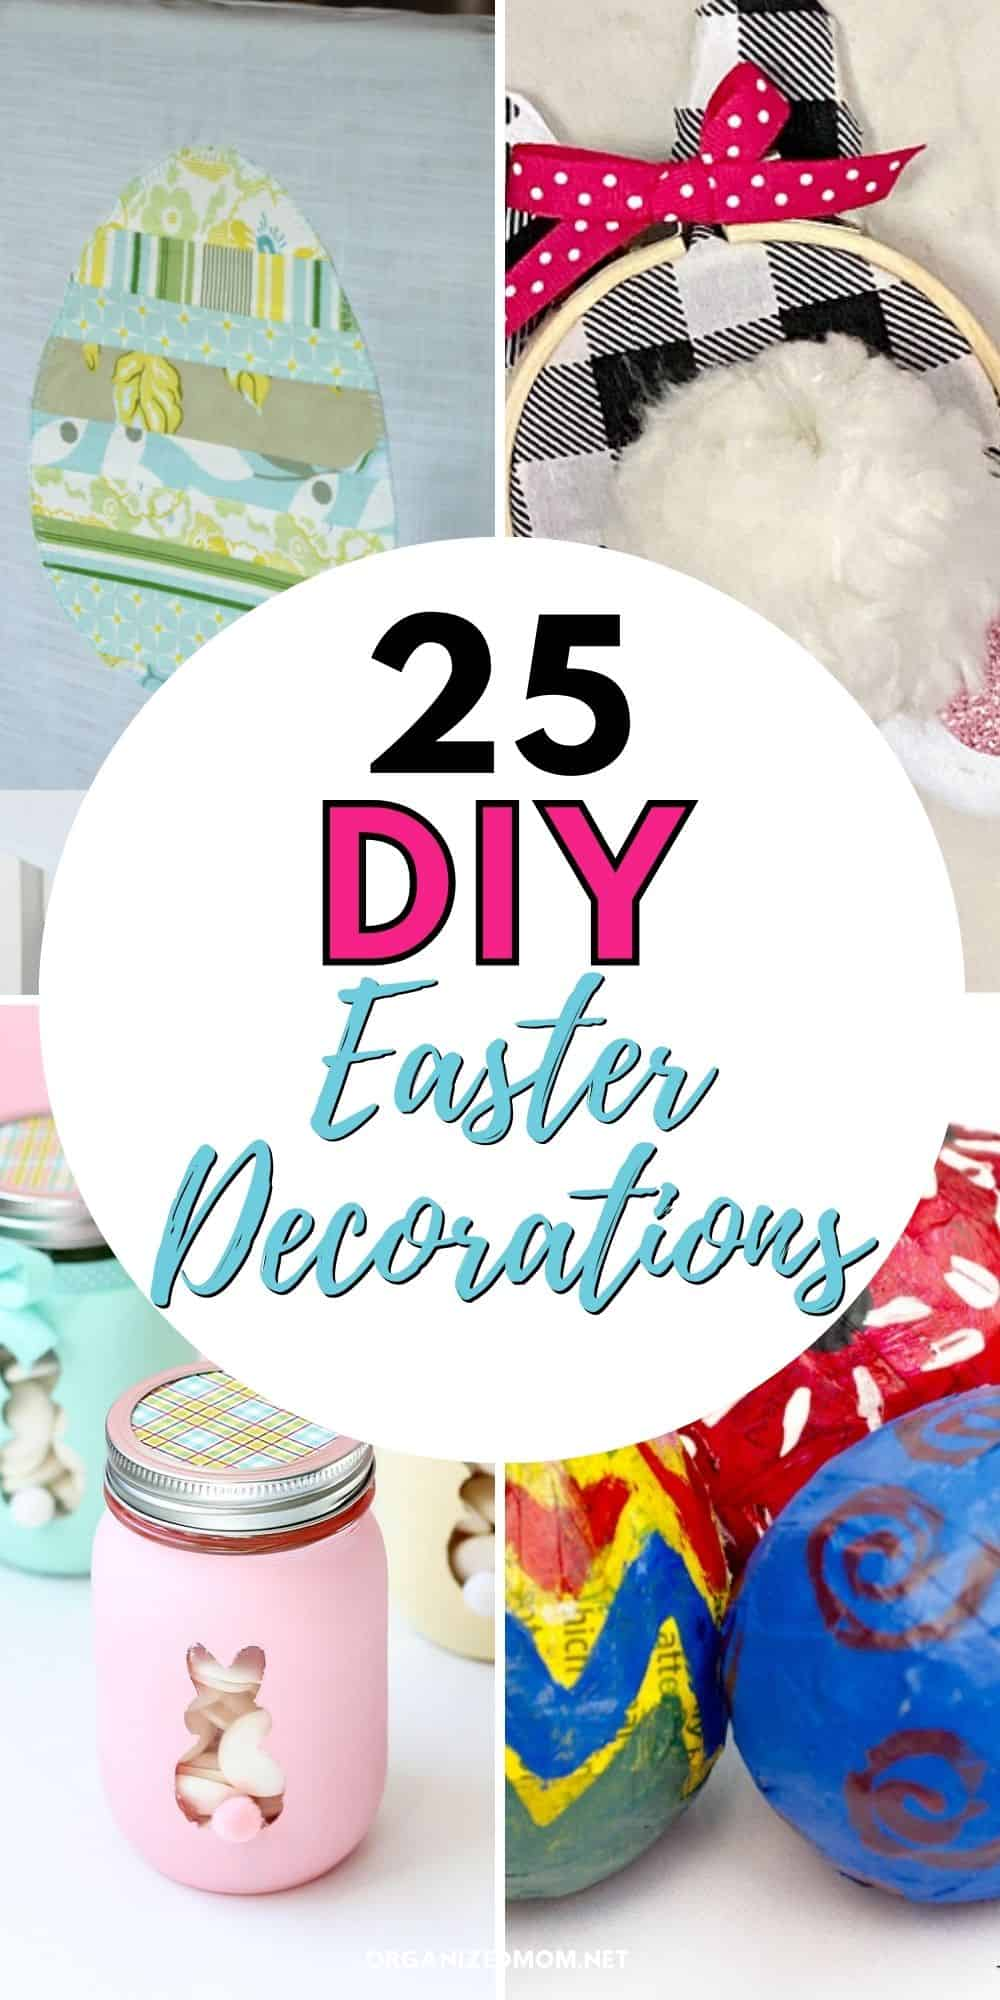 25 diy easter decorations